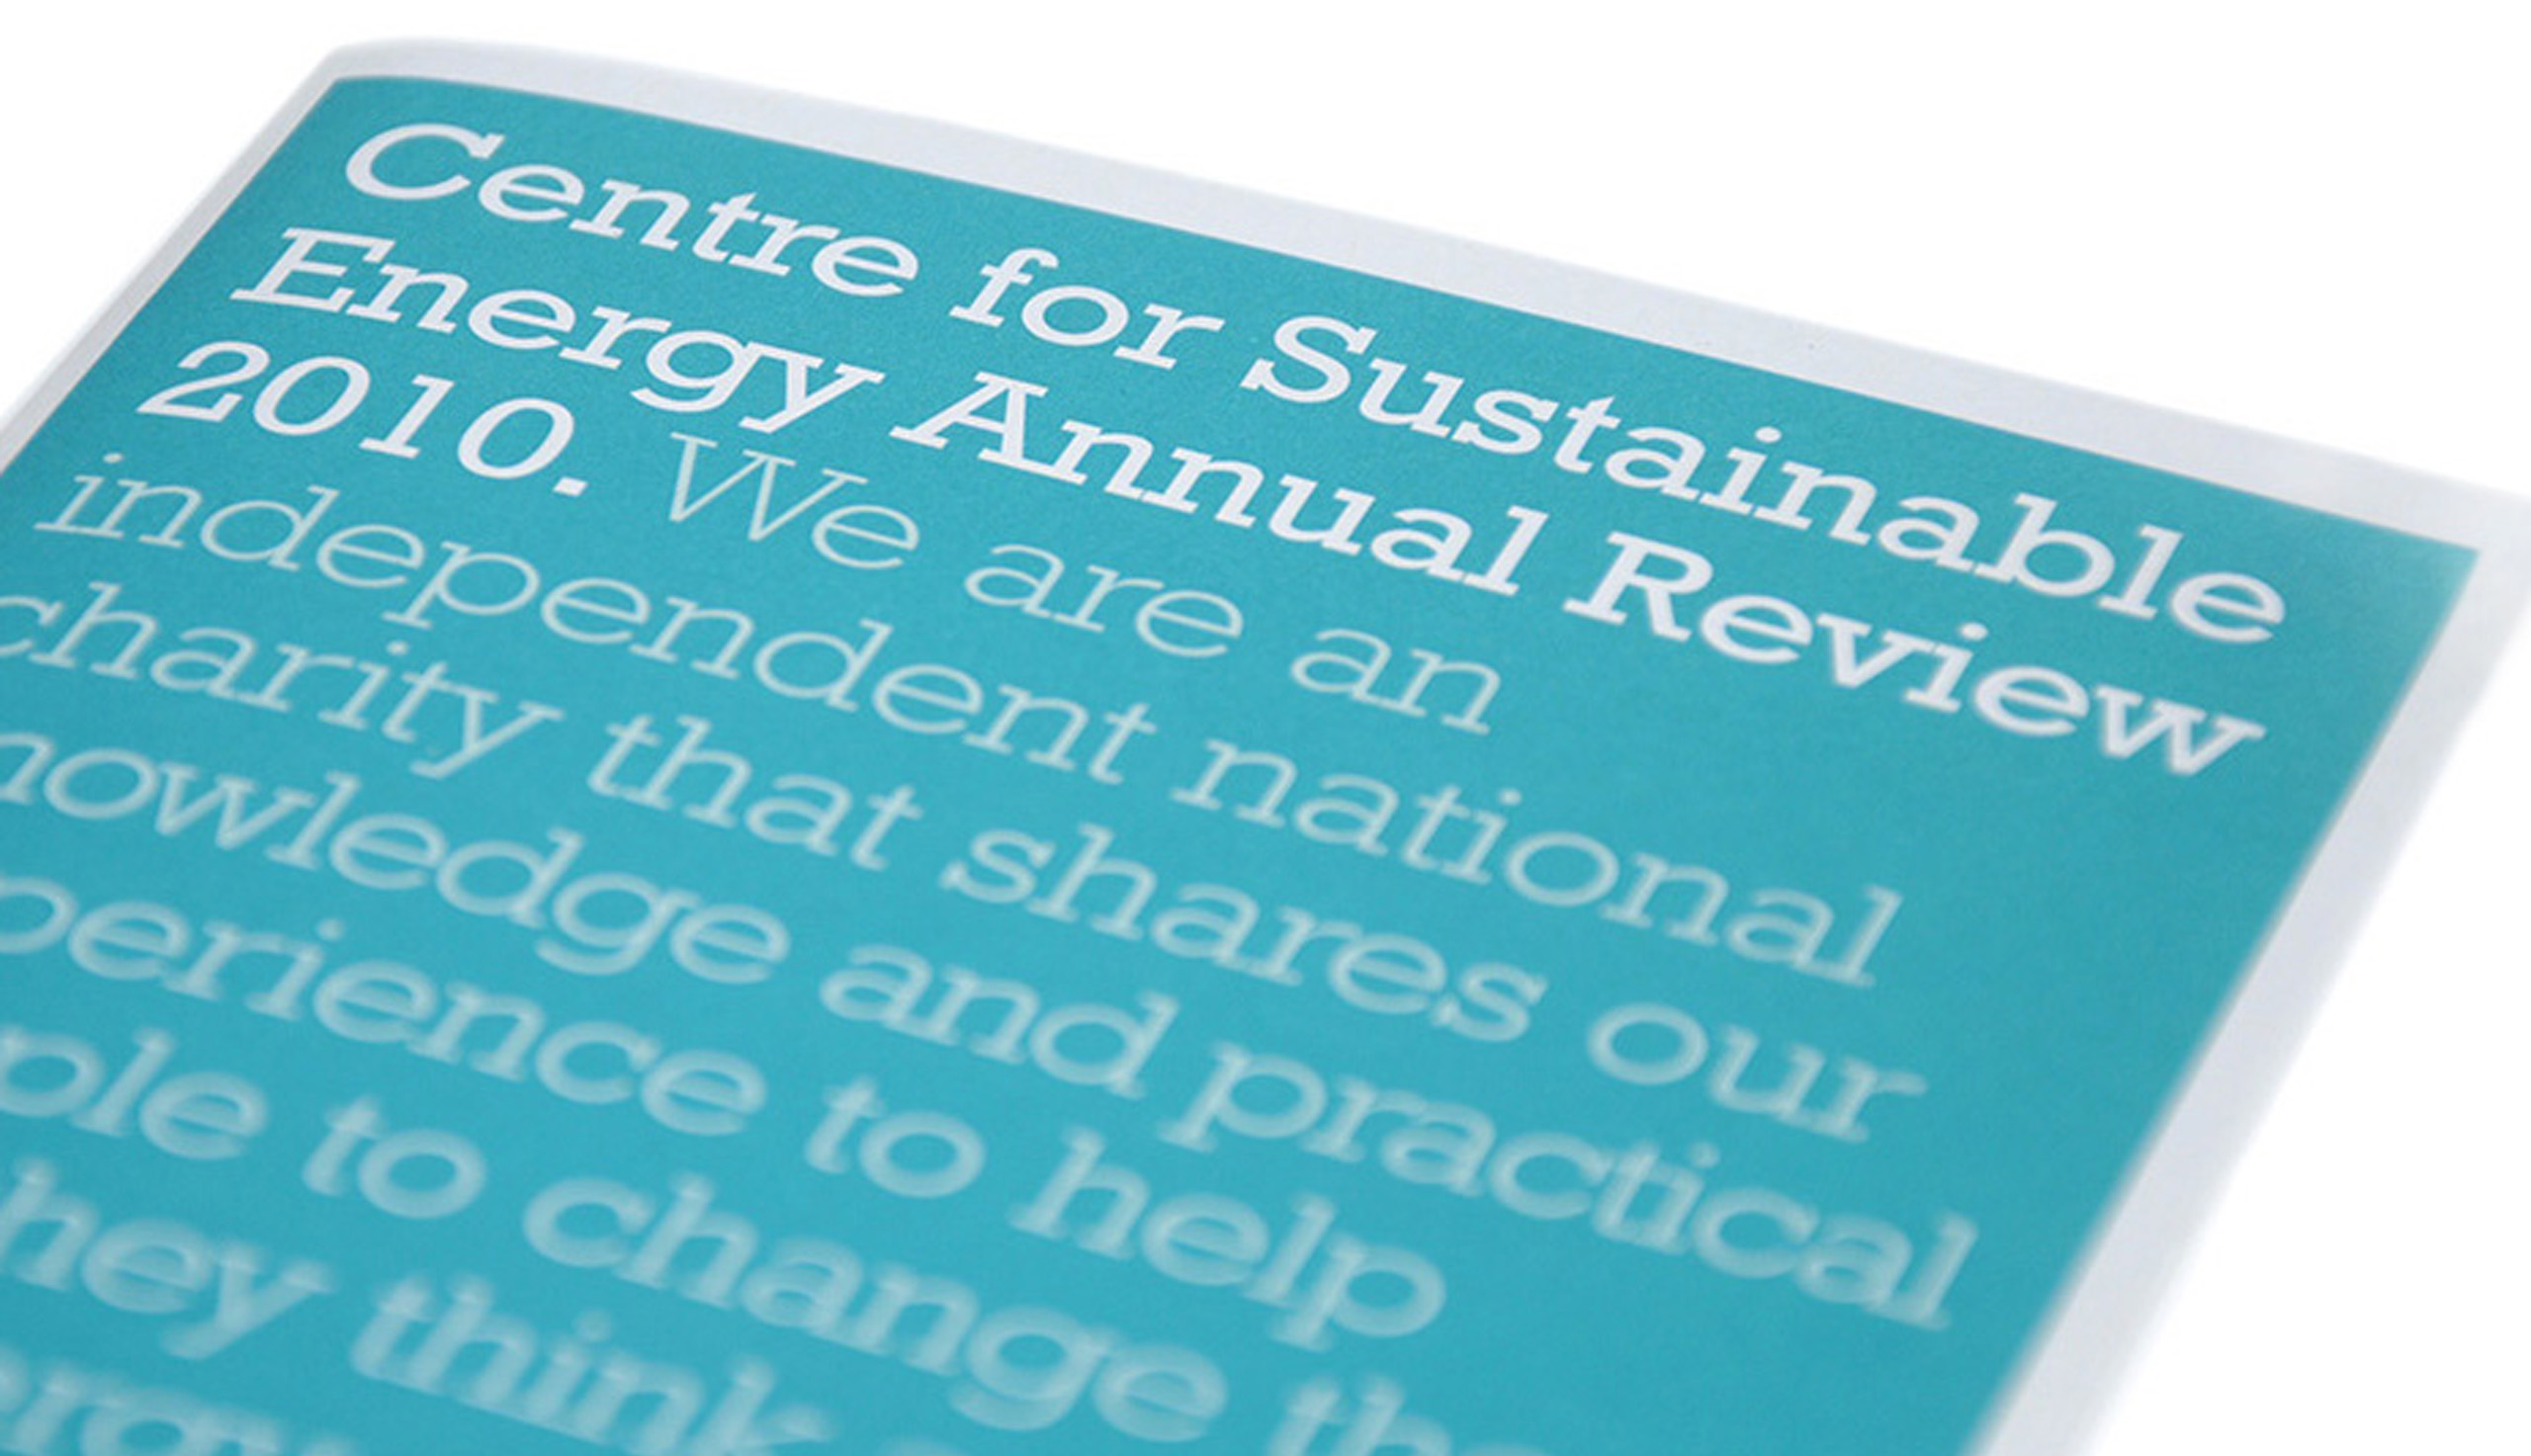 corporate identity, brand creation and development, CSE Annual Report cover design